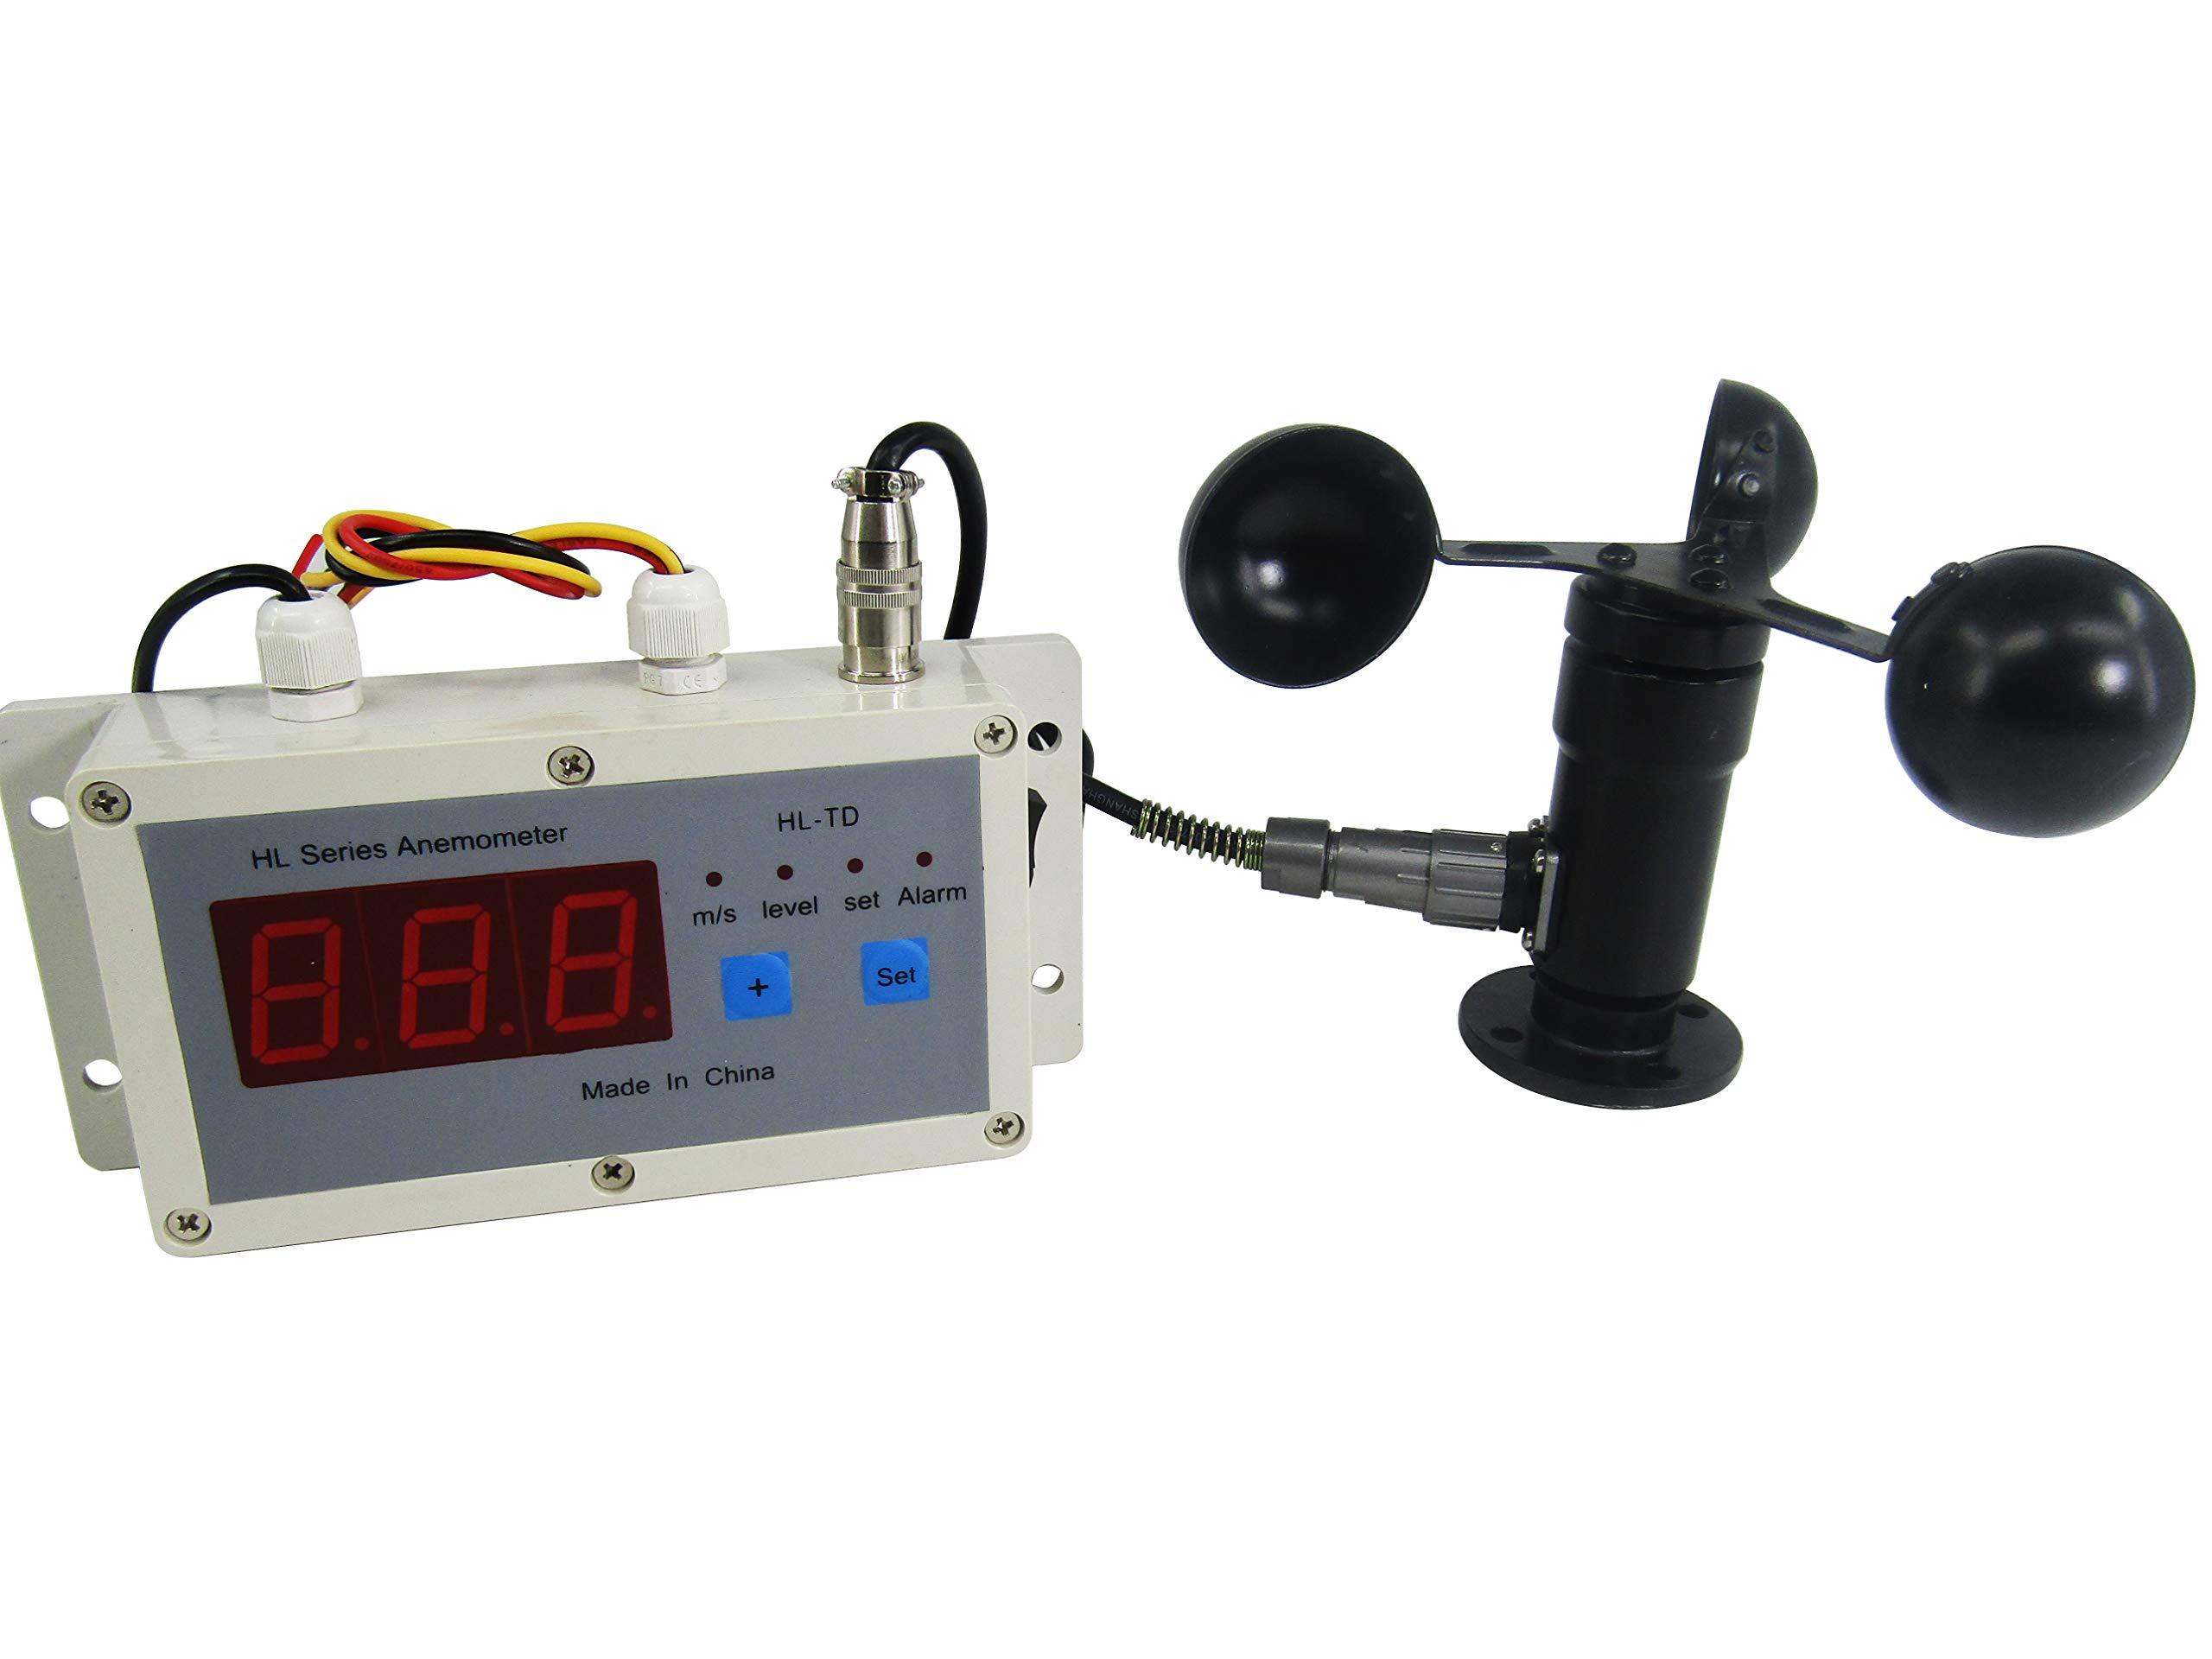 KUNHEWUHUA Wind Speed Alarm Device Anemometer Wind Speed Measurement & Control Instrument Gantry Crane Dedicated Anemometer Digital Display 110V by KUNHEWUHUA (Image #2)